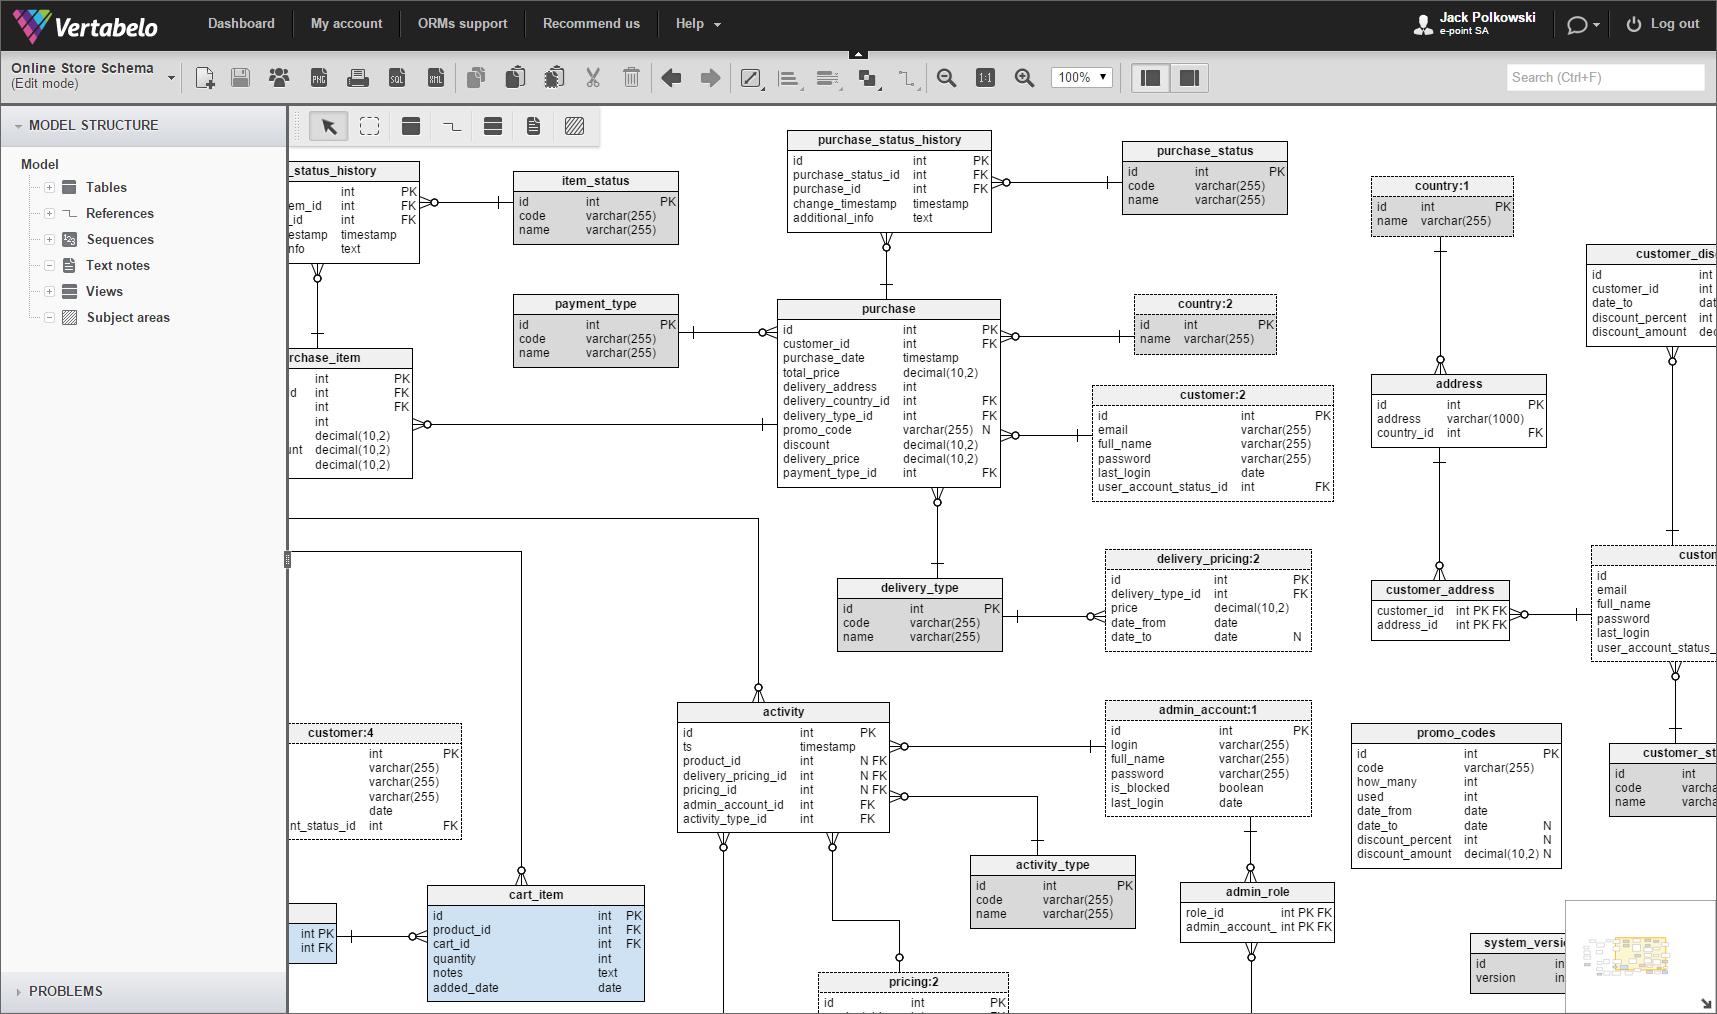 Vertabelo Database Modeler with regard to Database Model Diagram